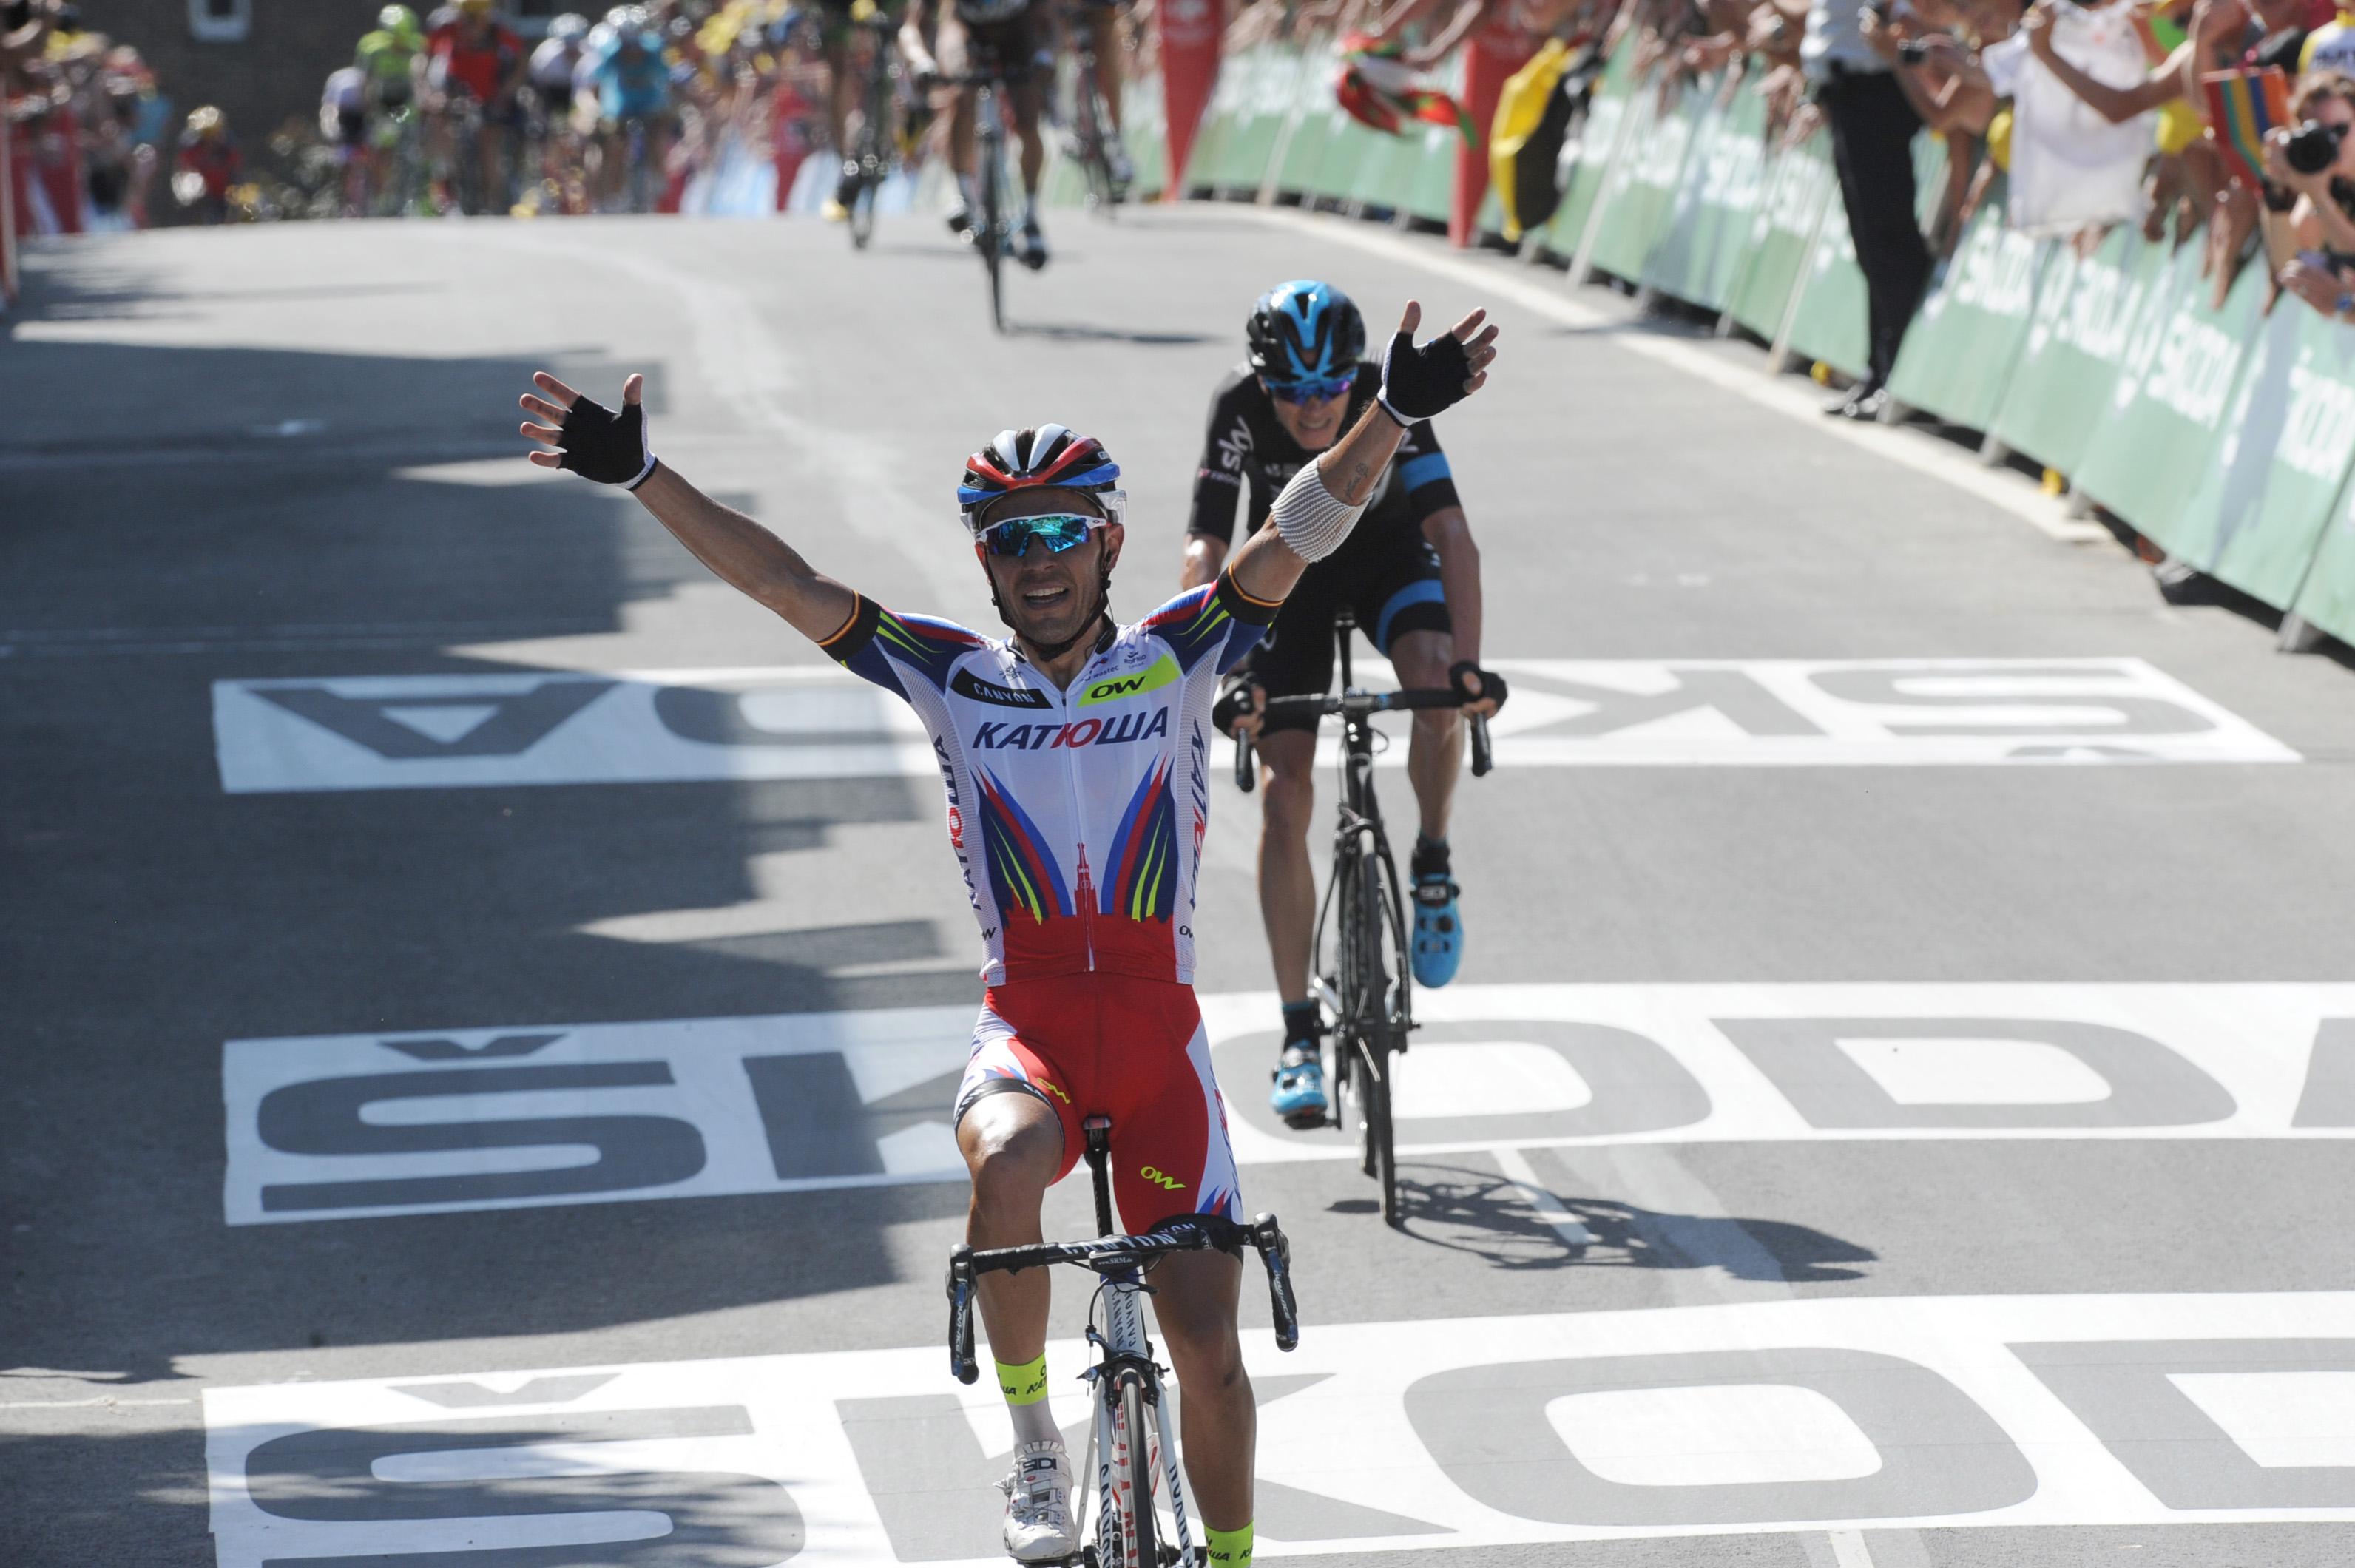 Joaquim Rodriguez gewinnt die 3. Etappe der Tour de France 2015. (pic: Sirotti)